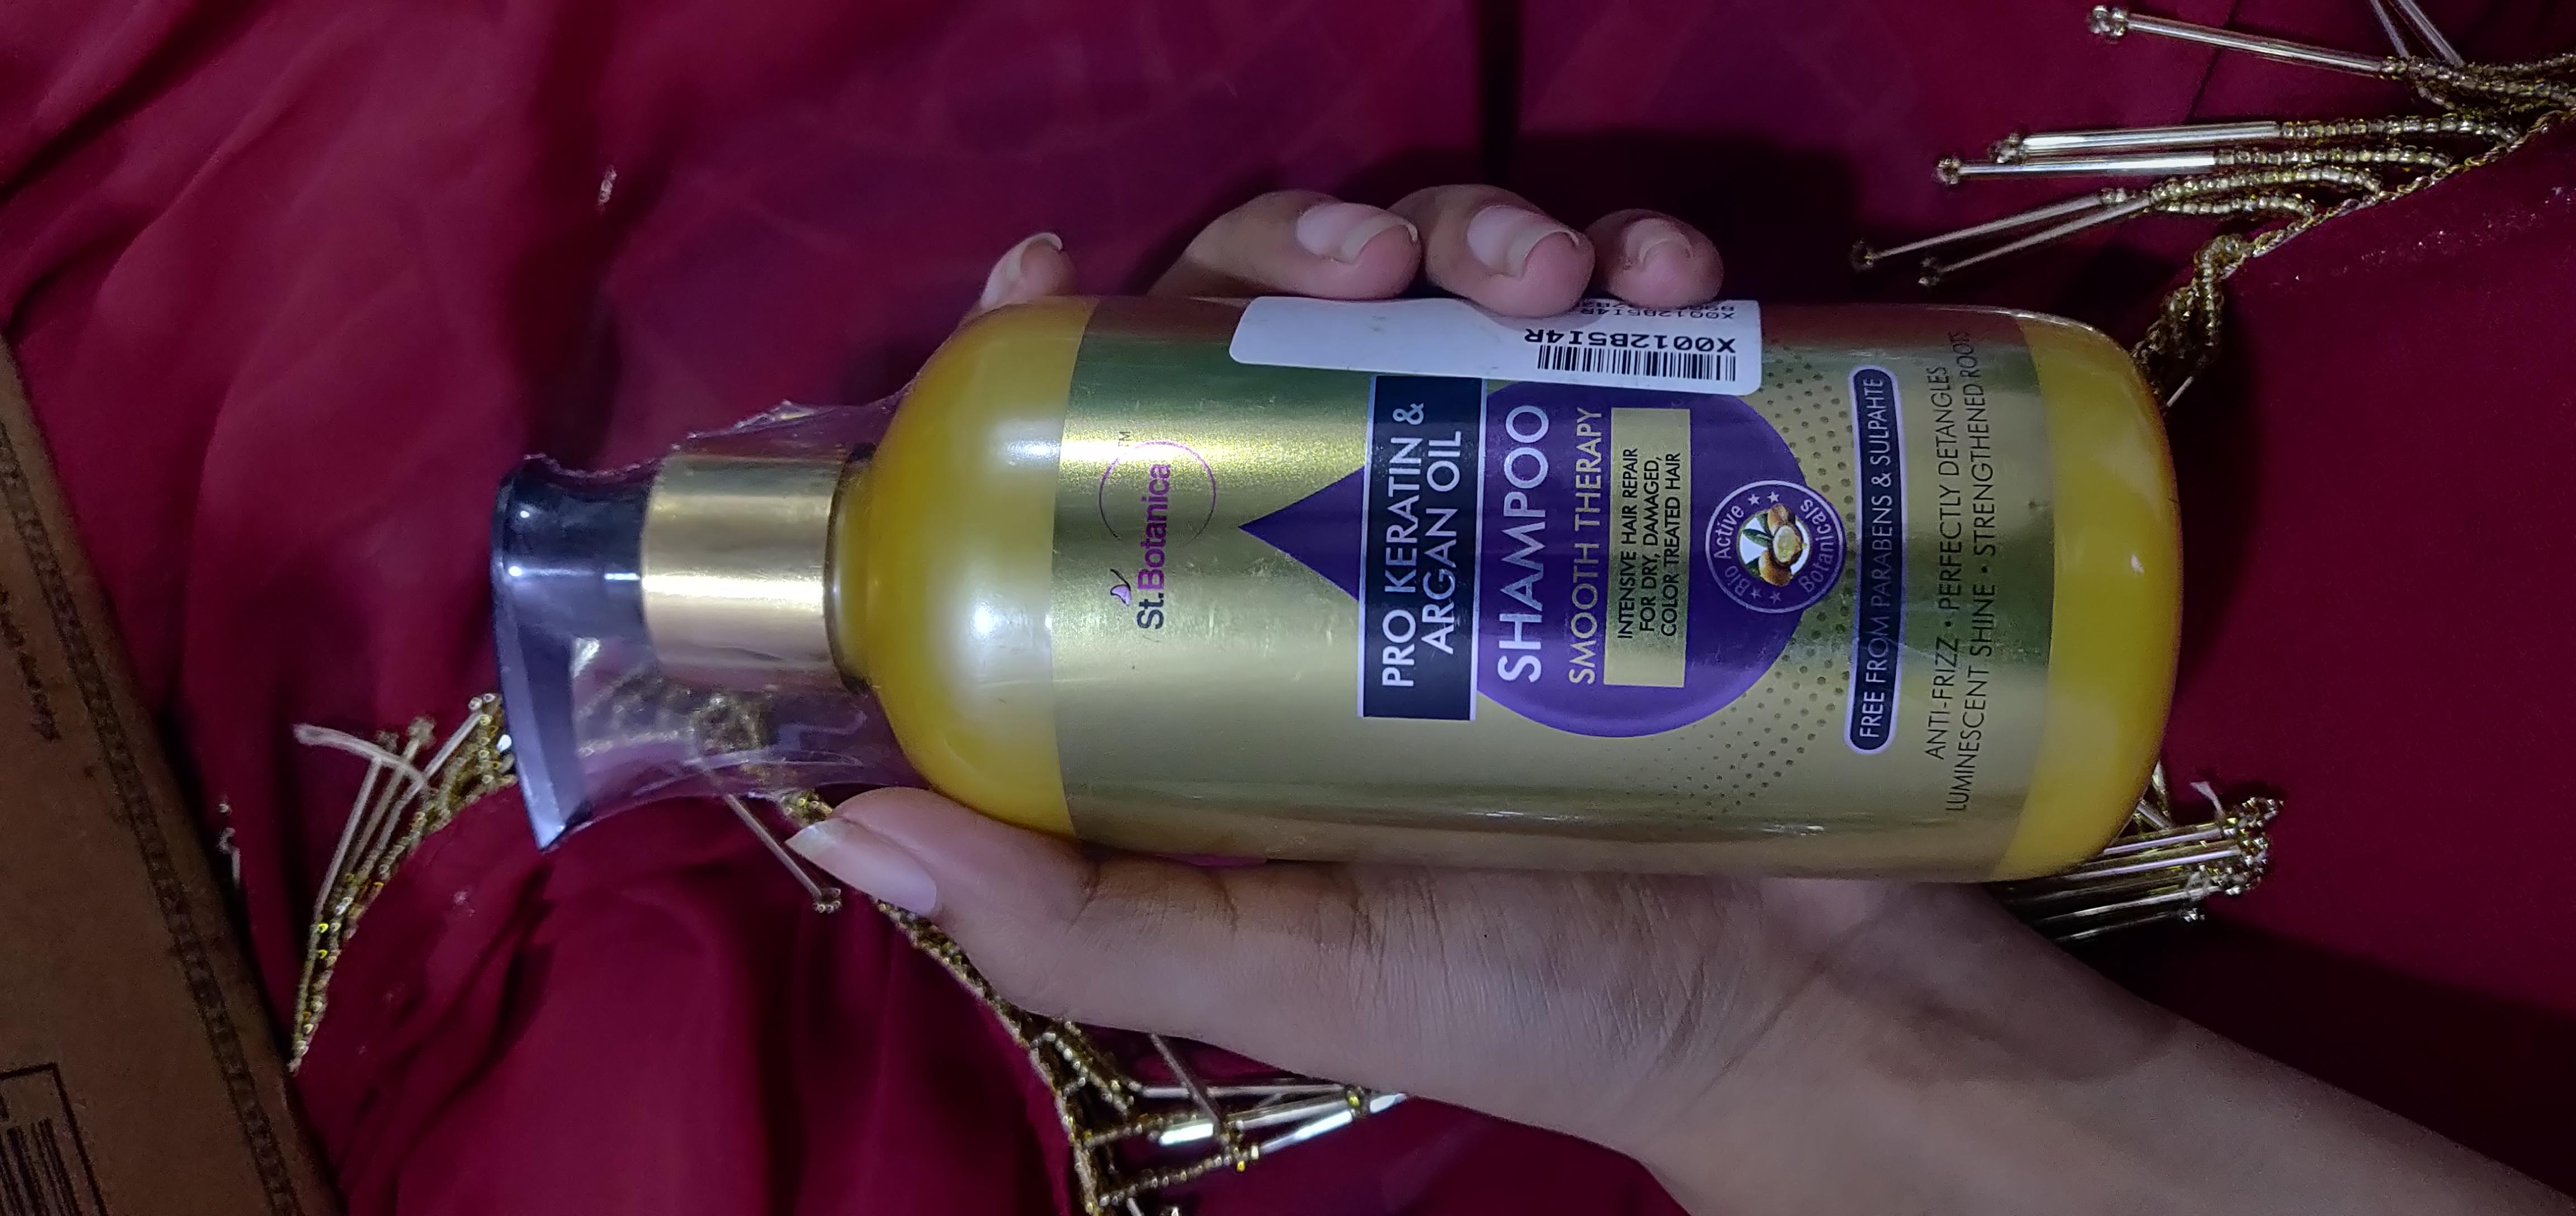 St.Botanica Pro Keratin & Argan Oil Shampoo-Average shampoo-By vaishvita-2